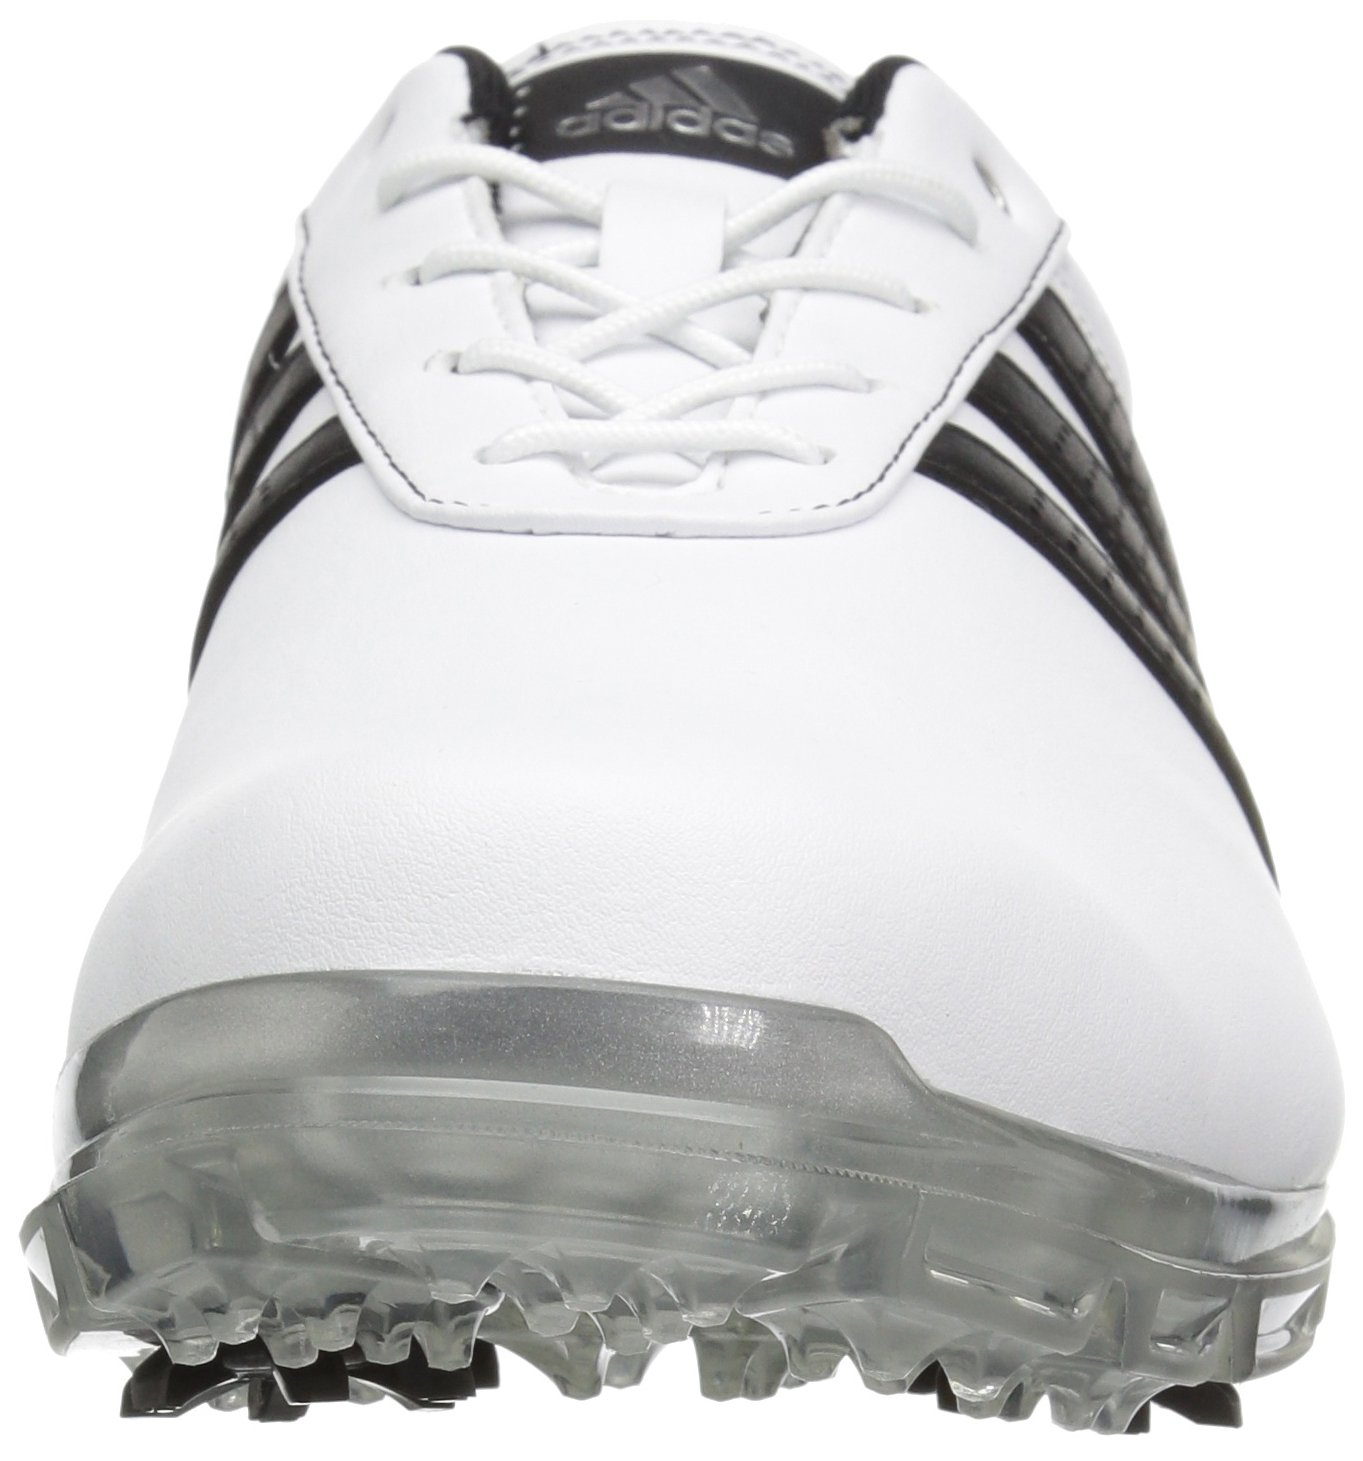 premium selection 14ad6 ce564 Zapatillas de golf Adidas Adipure Flex para hombre Blanco ne